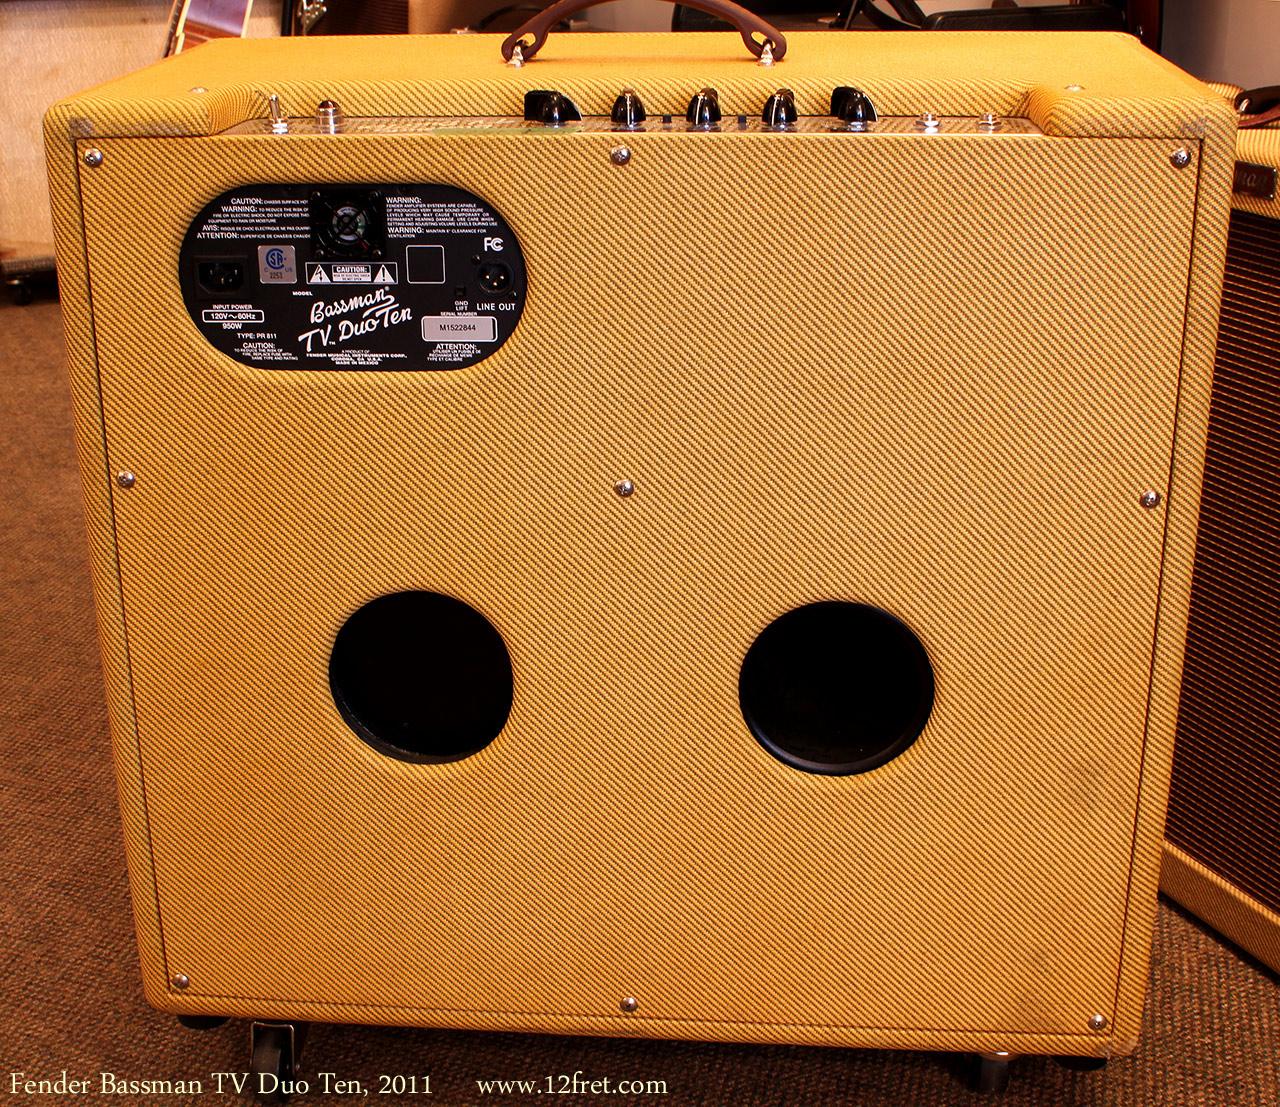 Fender-bassman-TV-Duo-ten-cons-rear-1